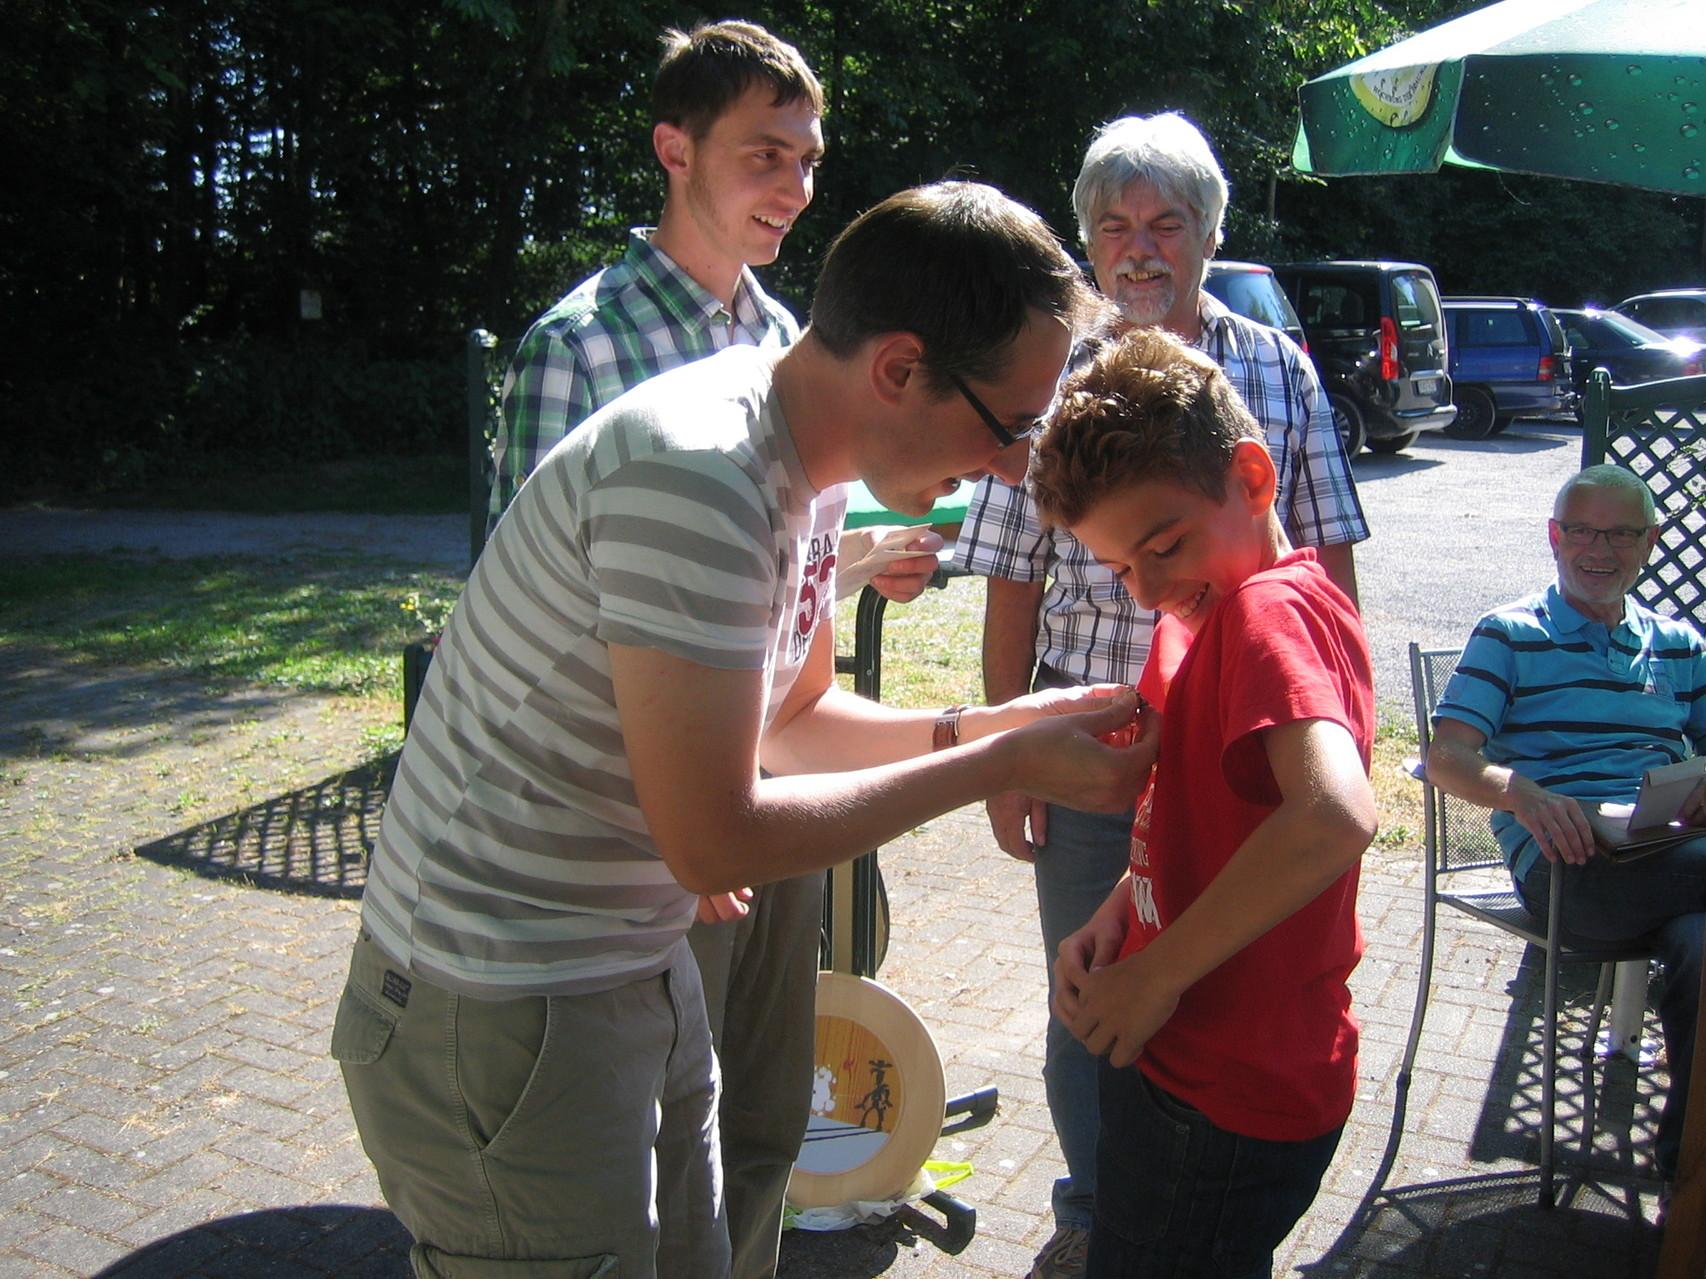 Proklamation der Königsfamilie 2014 - 2. Jugendritter Leon Reiter